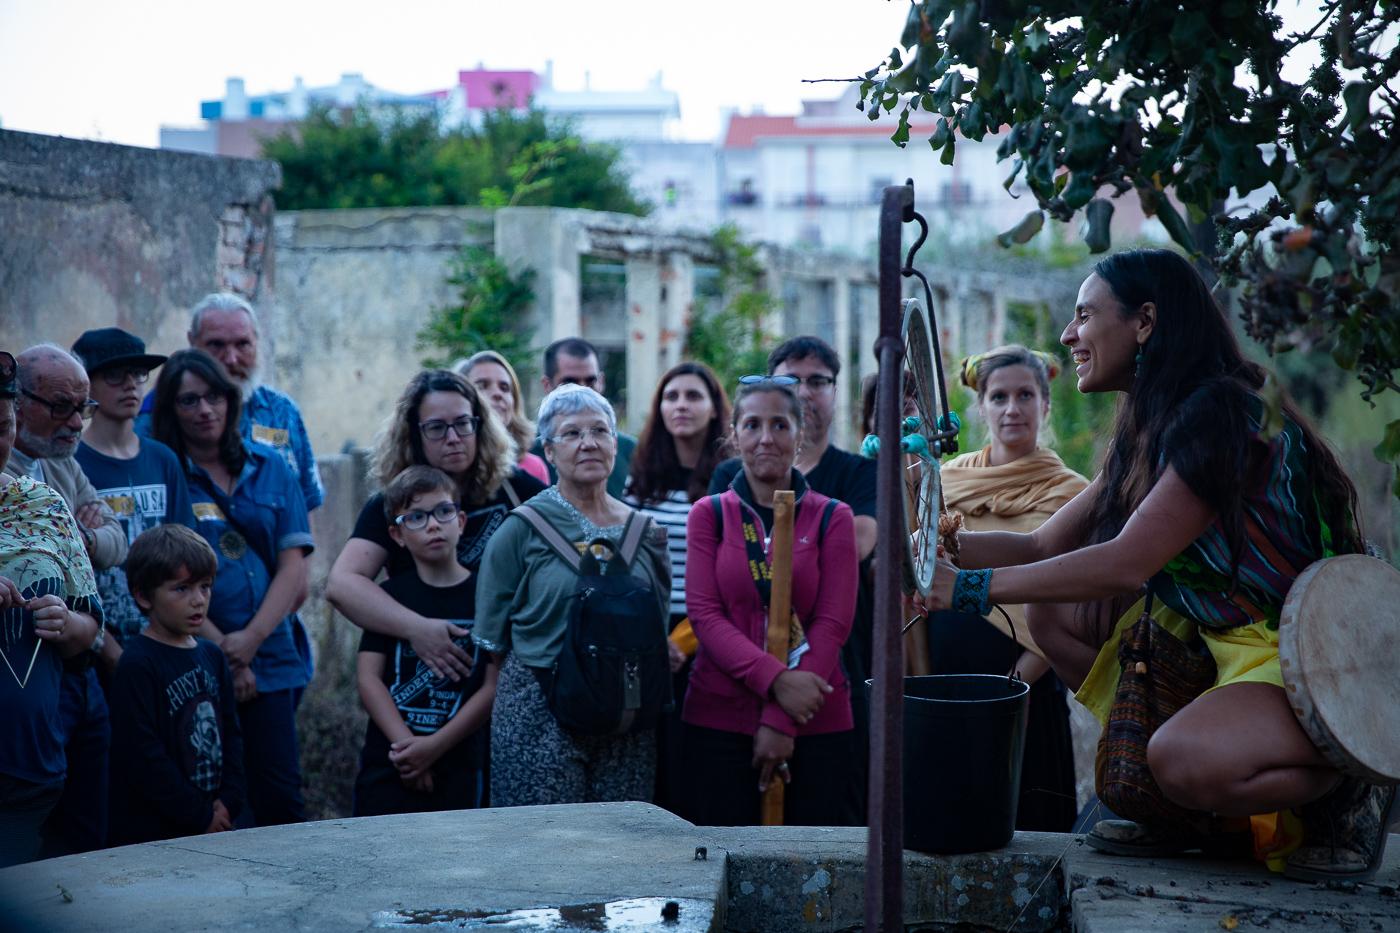 ohtli en MAR 2018 (Sines, Portugal) - Foto de Alípio Padilha15.jpg